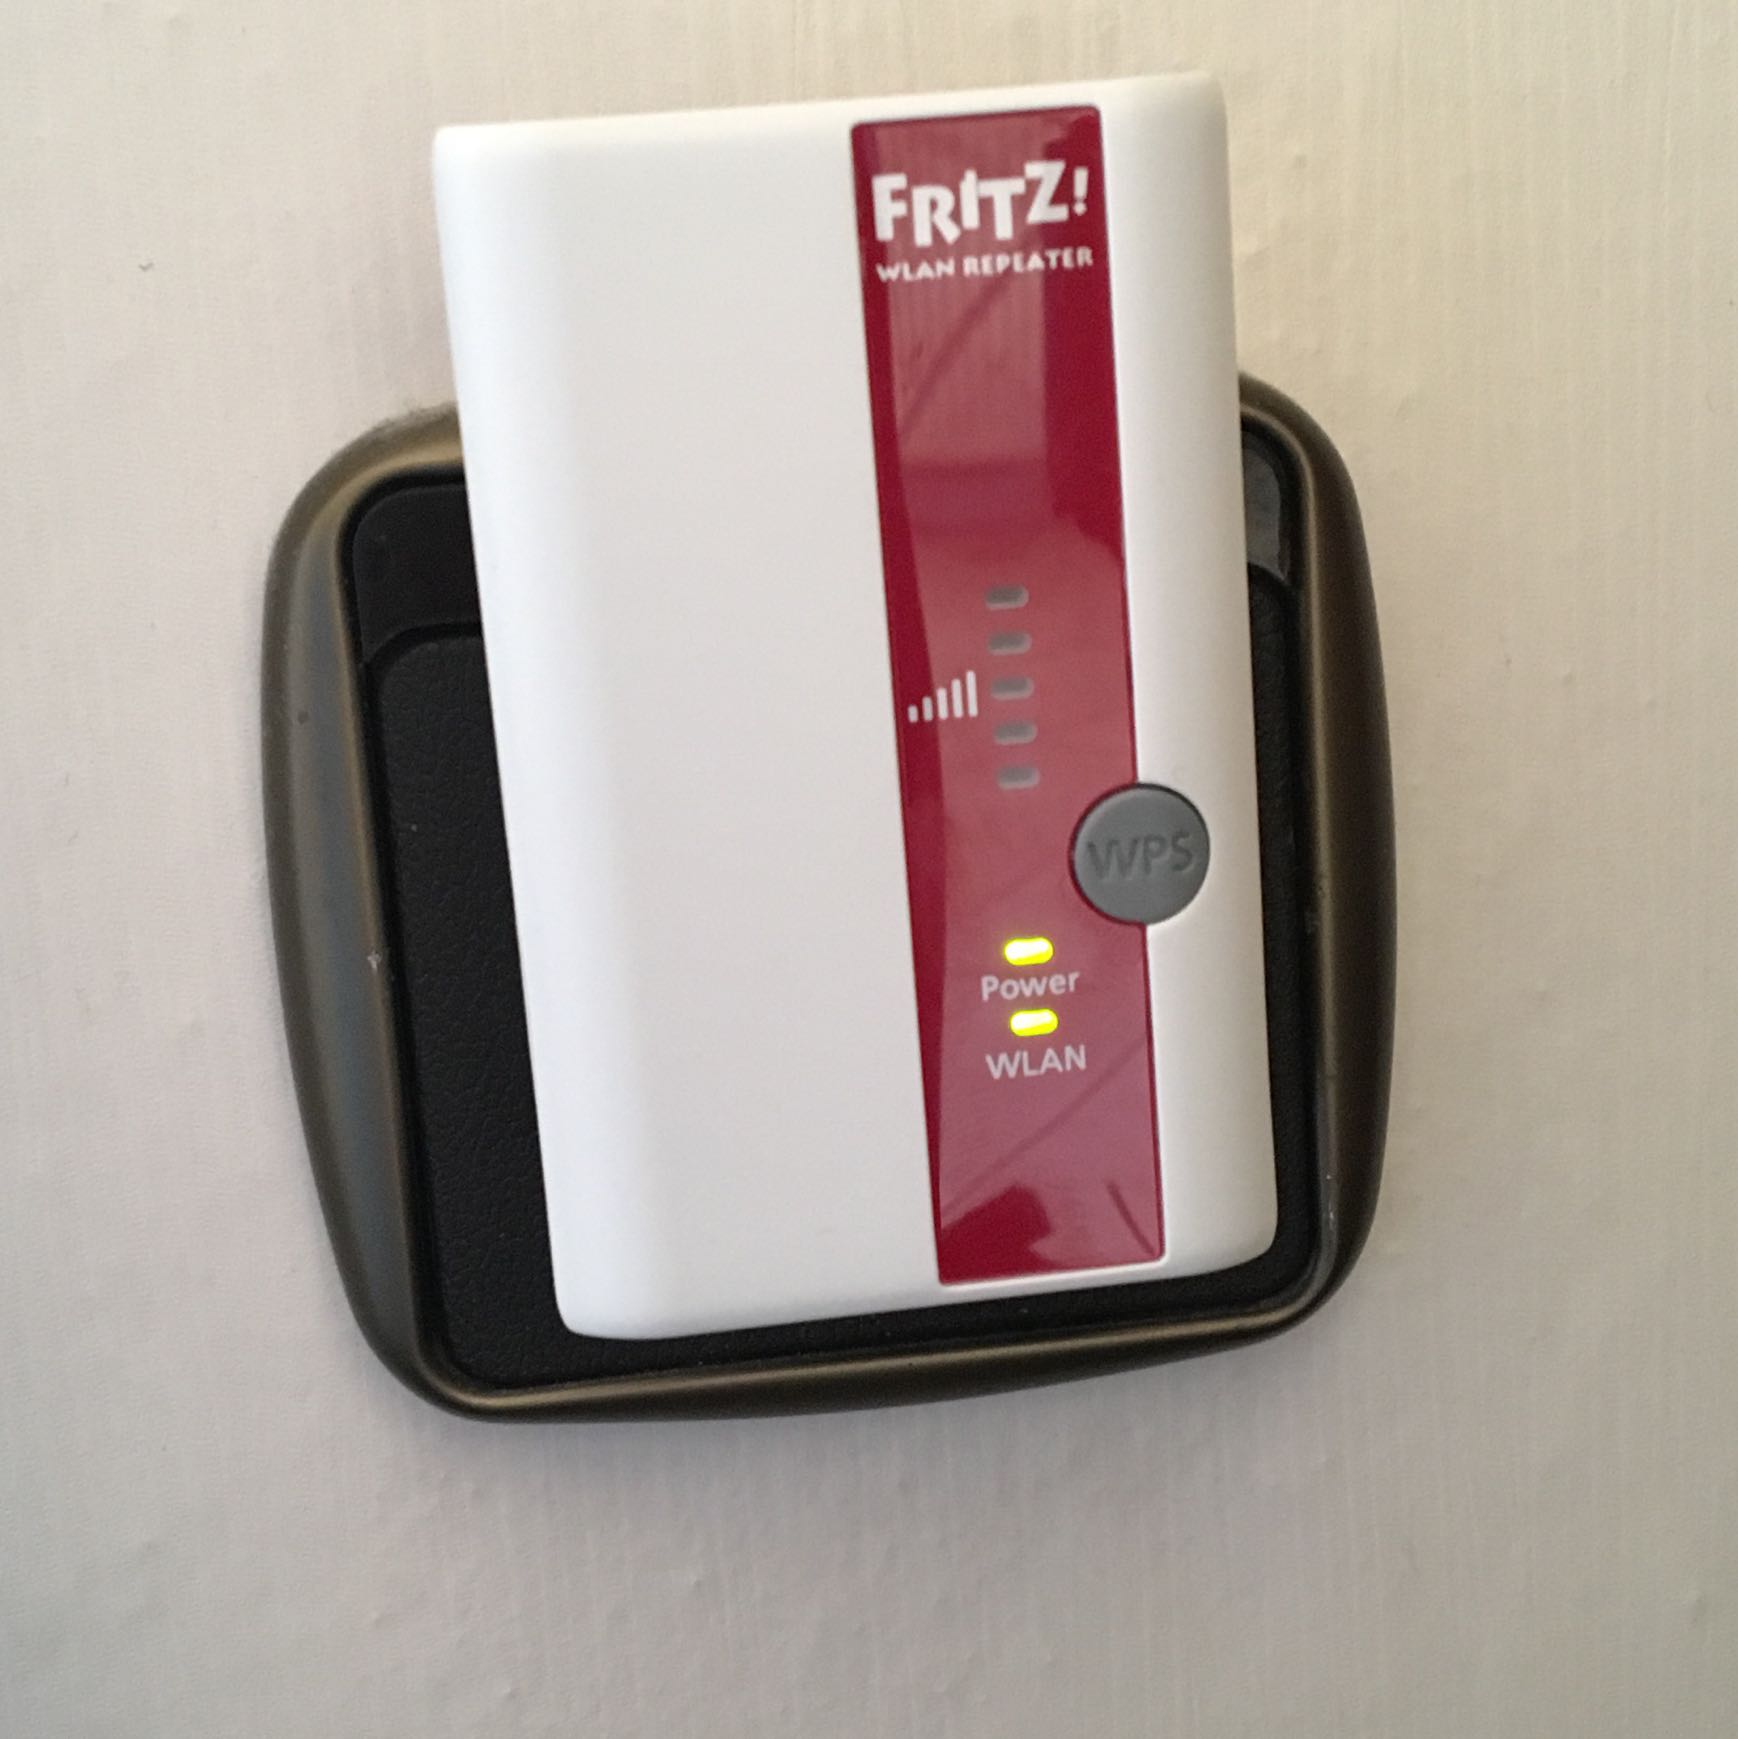 fritz repeater 310 verbindet sich nicht mit dem speedport 723v typ a internet wlan router. Black Bedroom Furniture Sets. Home Design Ideas